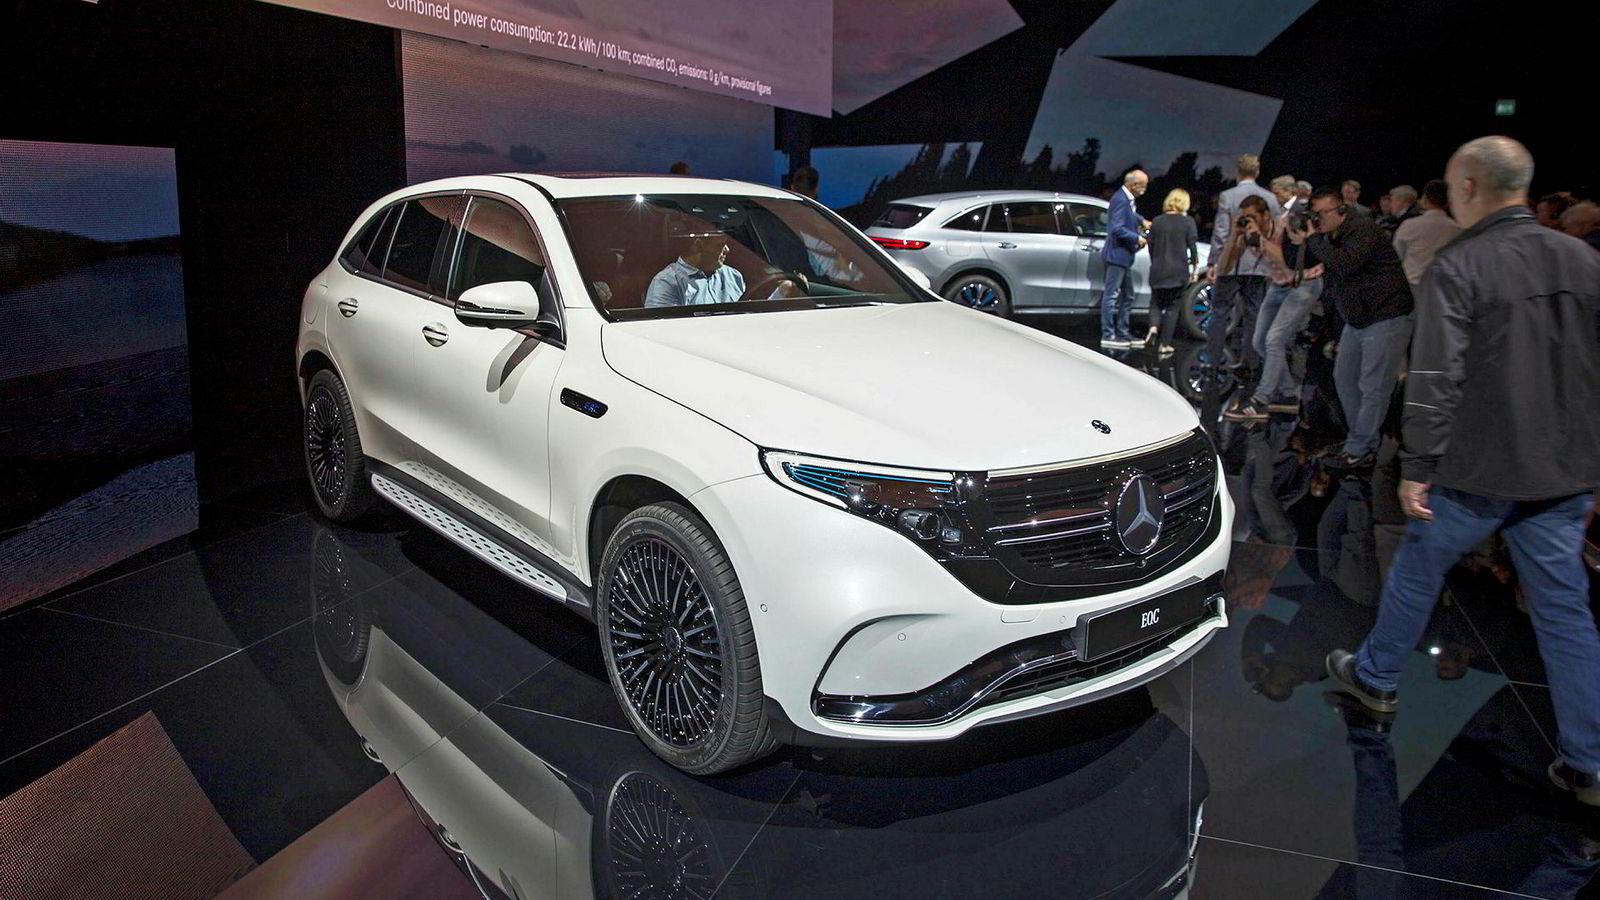 Mercedes-Benz EQC var populær allerede under avdukningen i Stockholm. Importøren har allerede over 2000 nordmenn på venteliste.